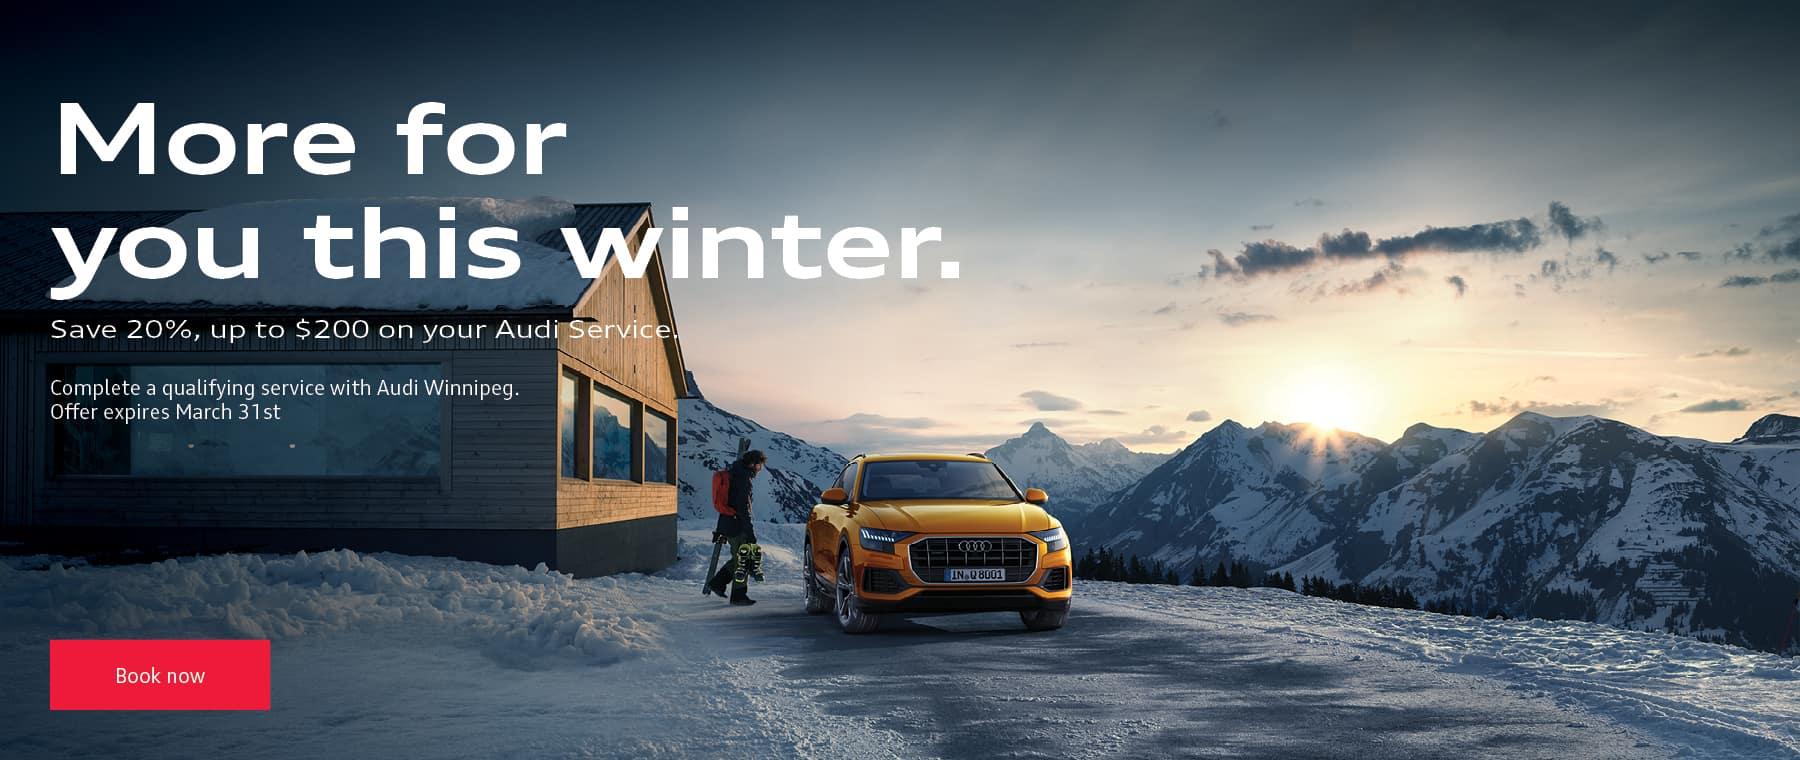 Audi-Wpg-Winter-Service-Offer – Web-Banner